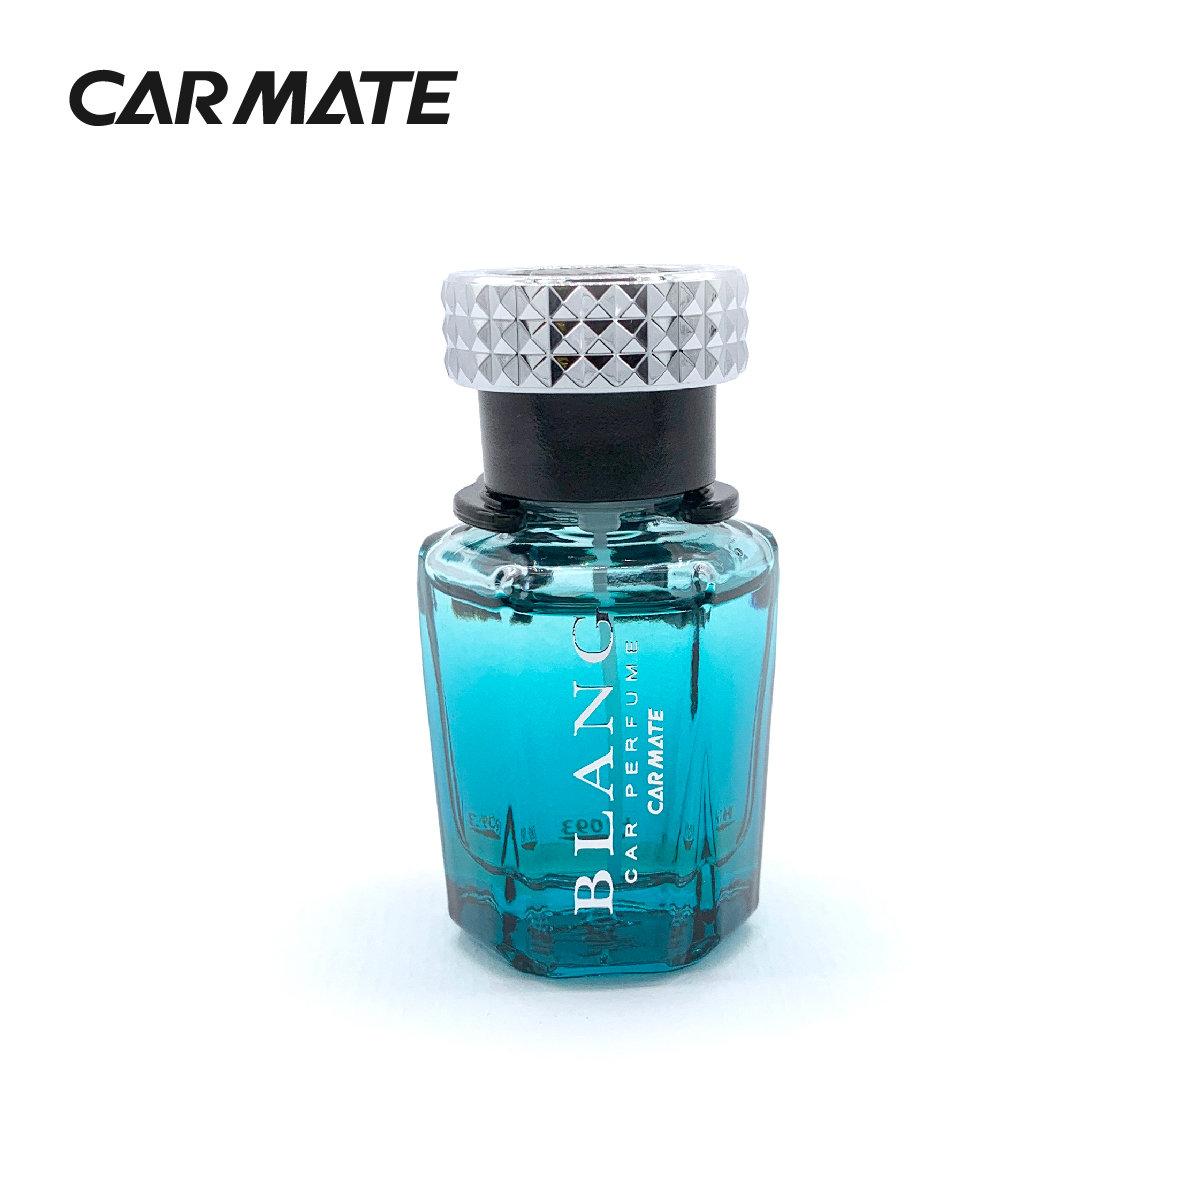 CARMATE BLANG - 汽車黑森林香水 (綠色)